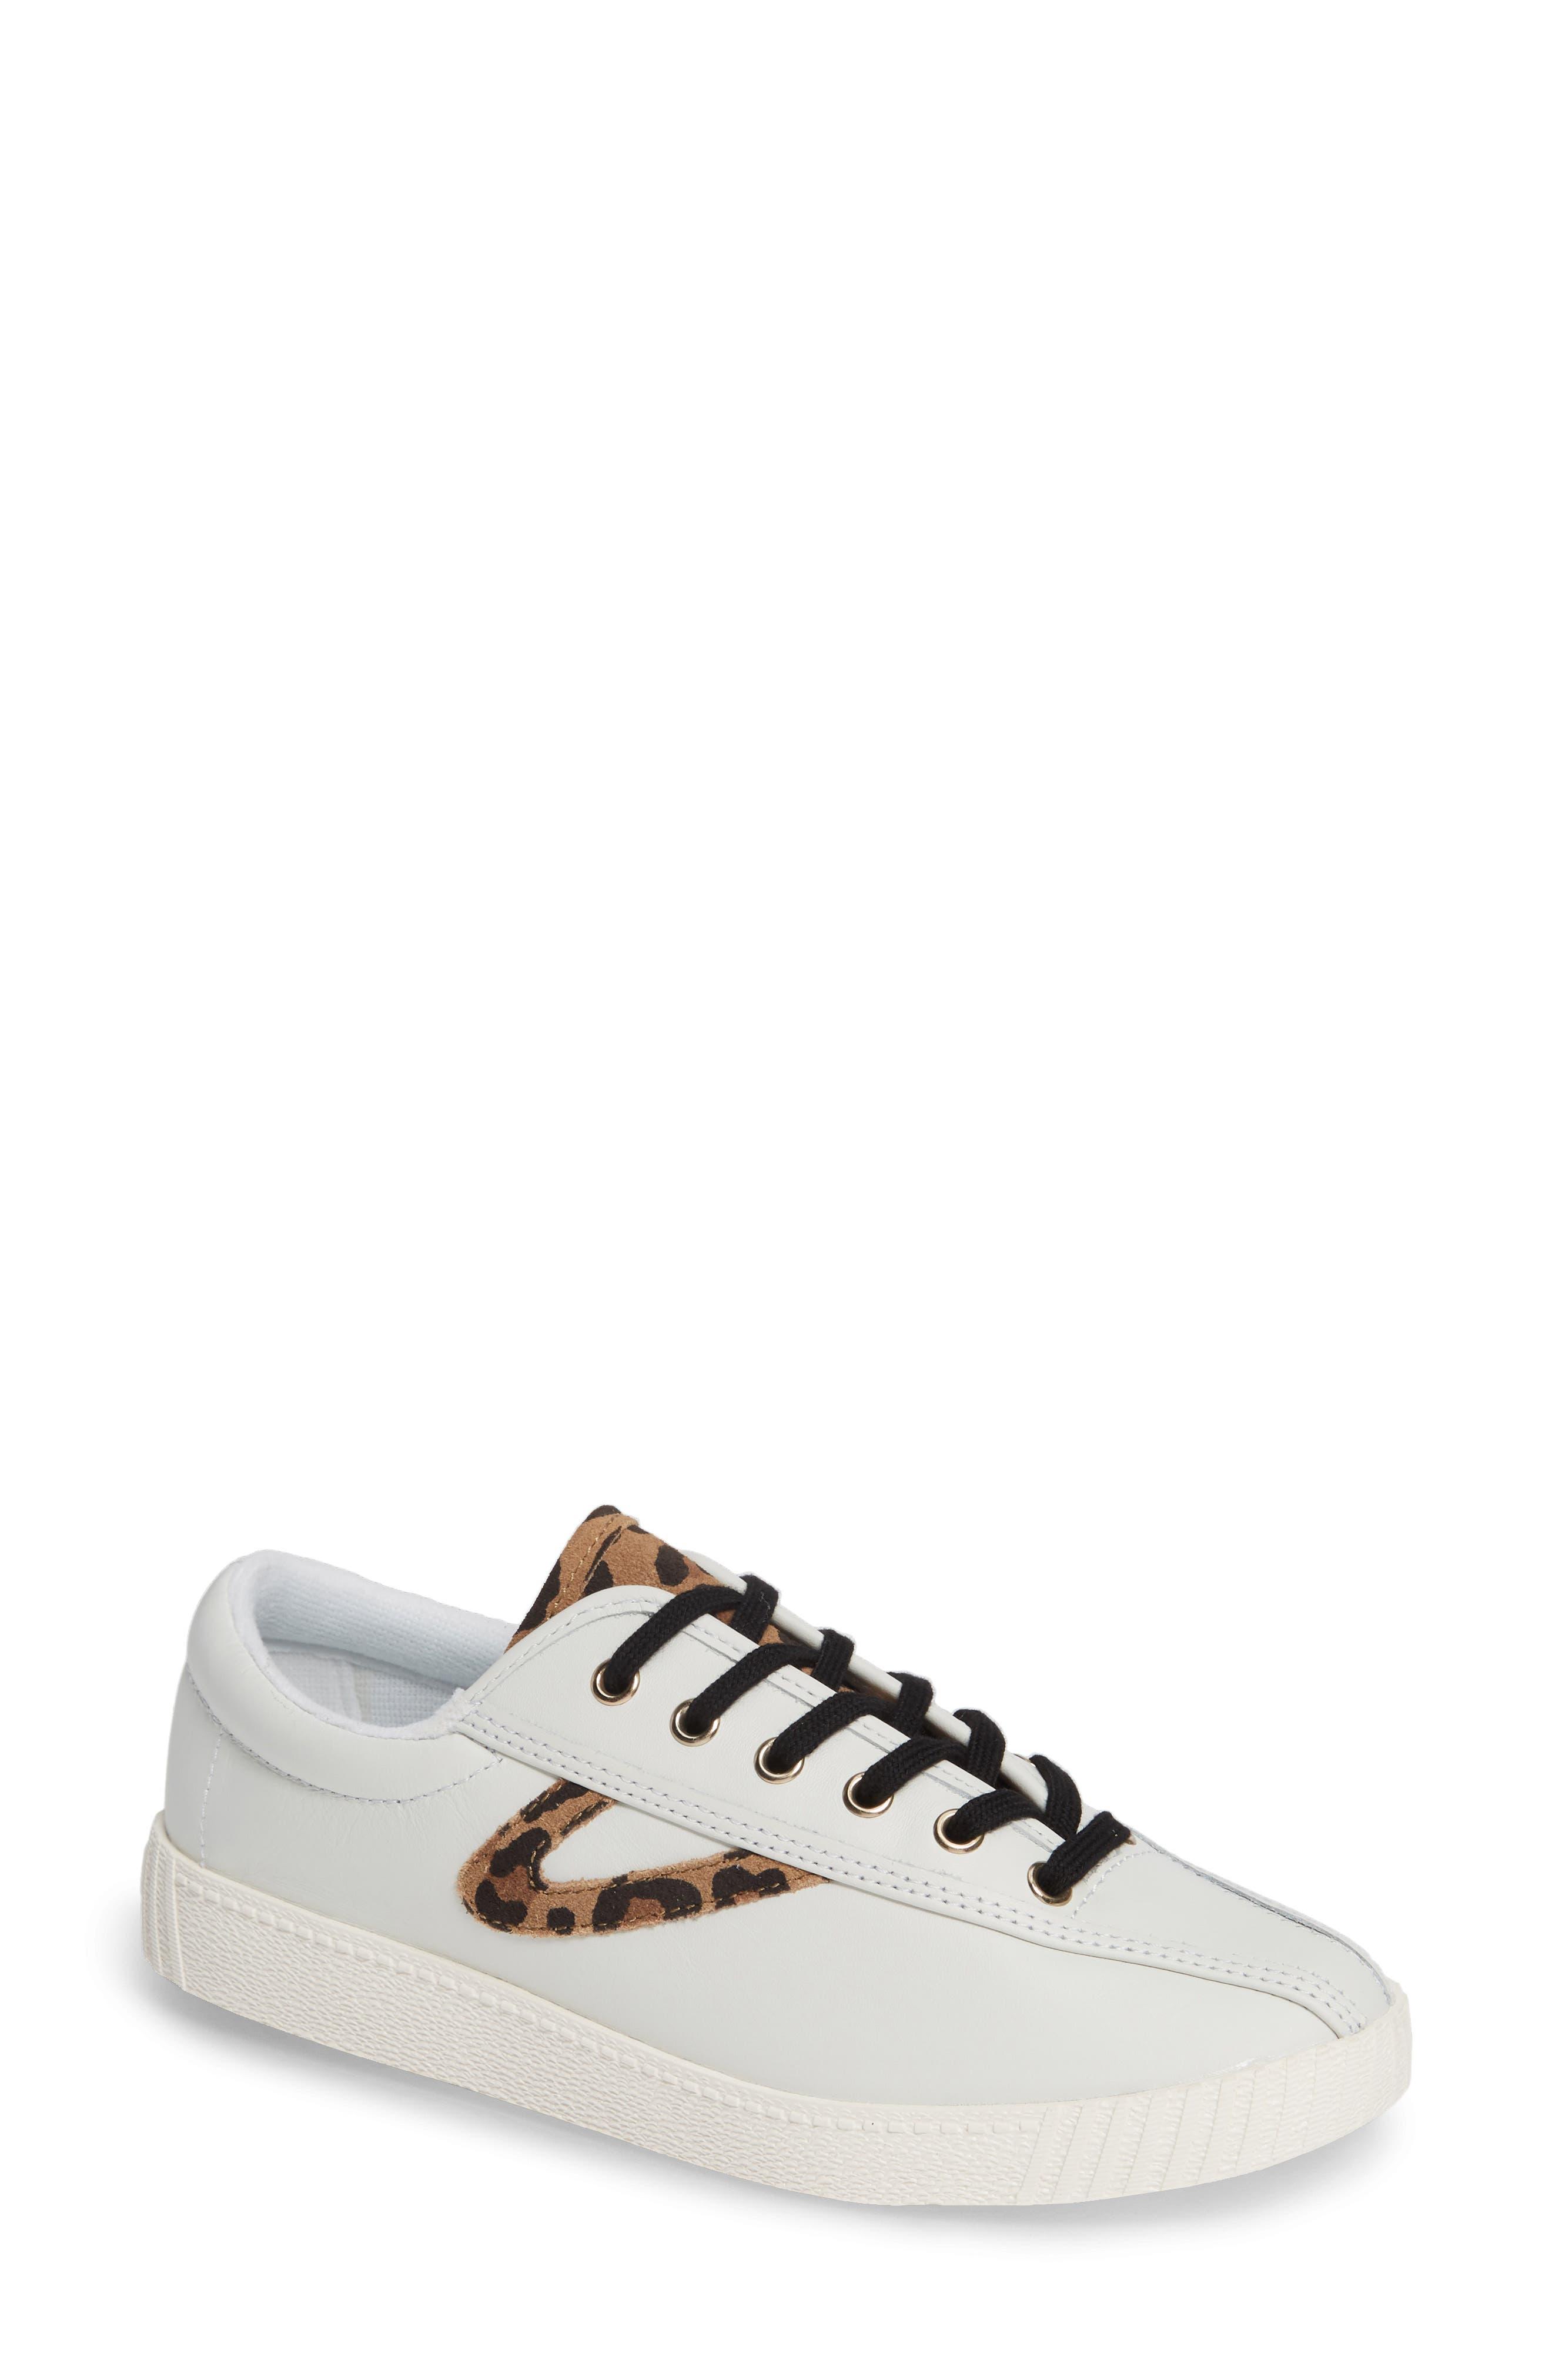 Patterned Sneaker,                         Main,                         color, Vintage White/ Tan Multi